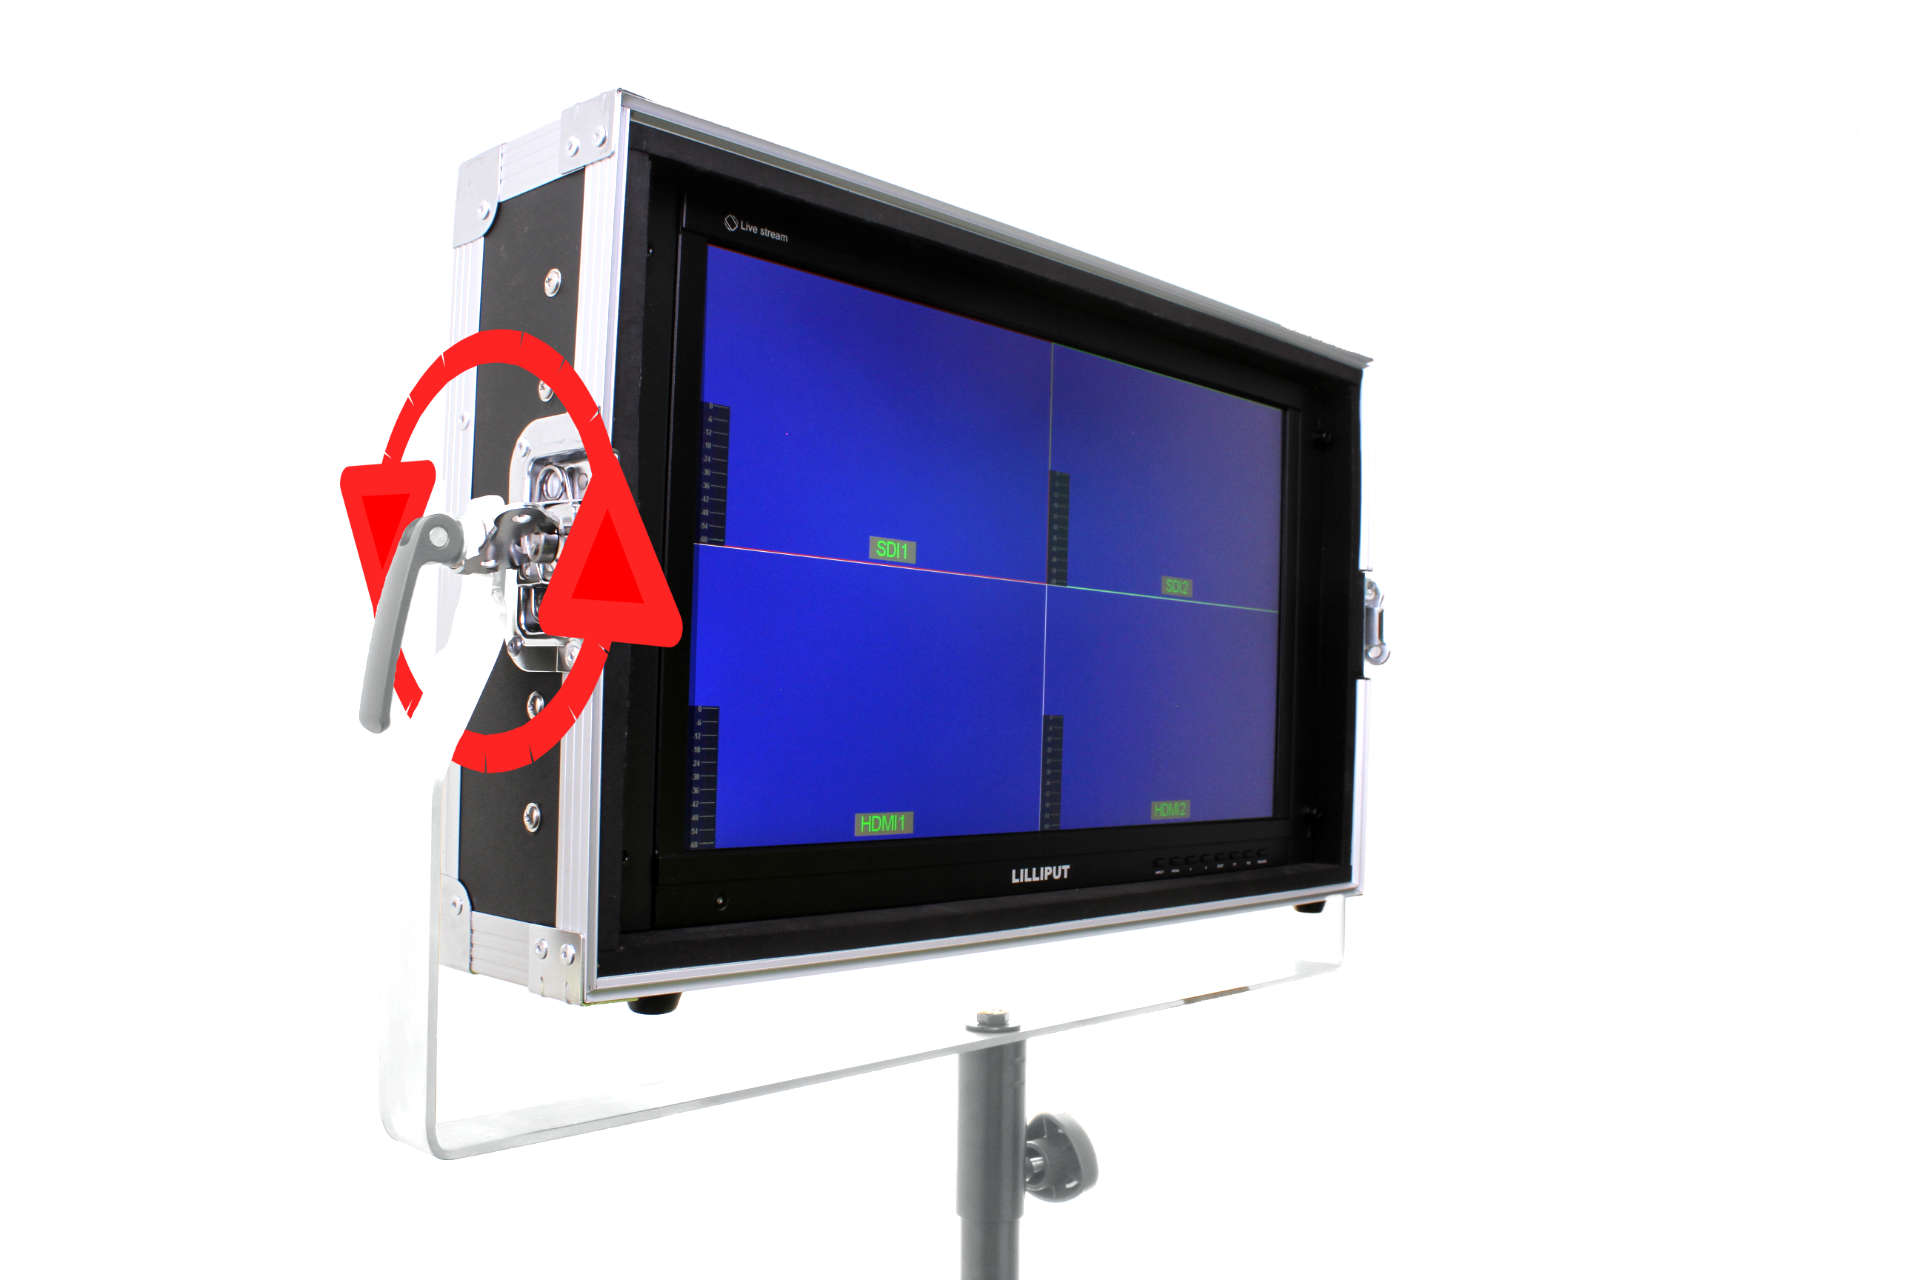 Artikelfoto 1 Lilliput PVM220S-FC 21.5 Zoll PRO SDI Monitor mit Flightcase